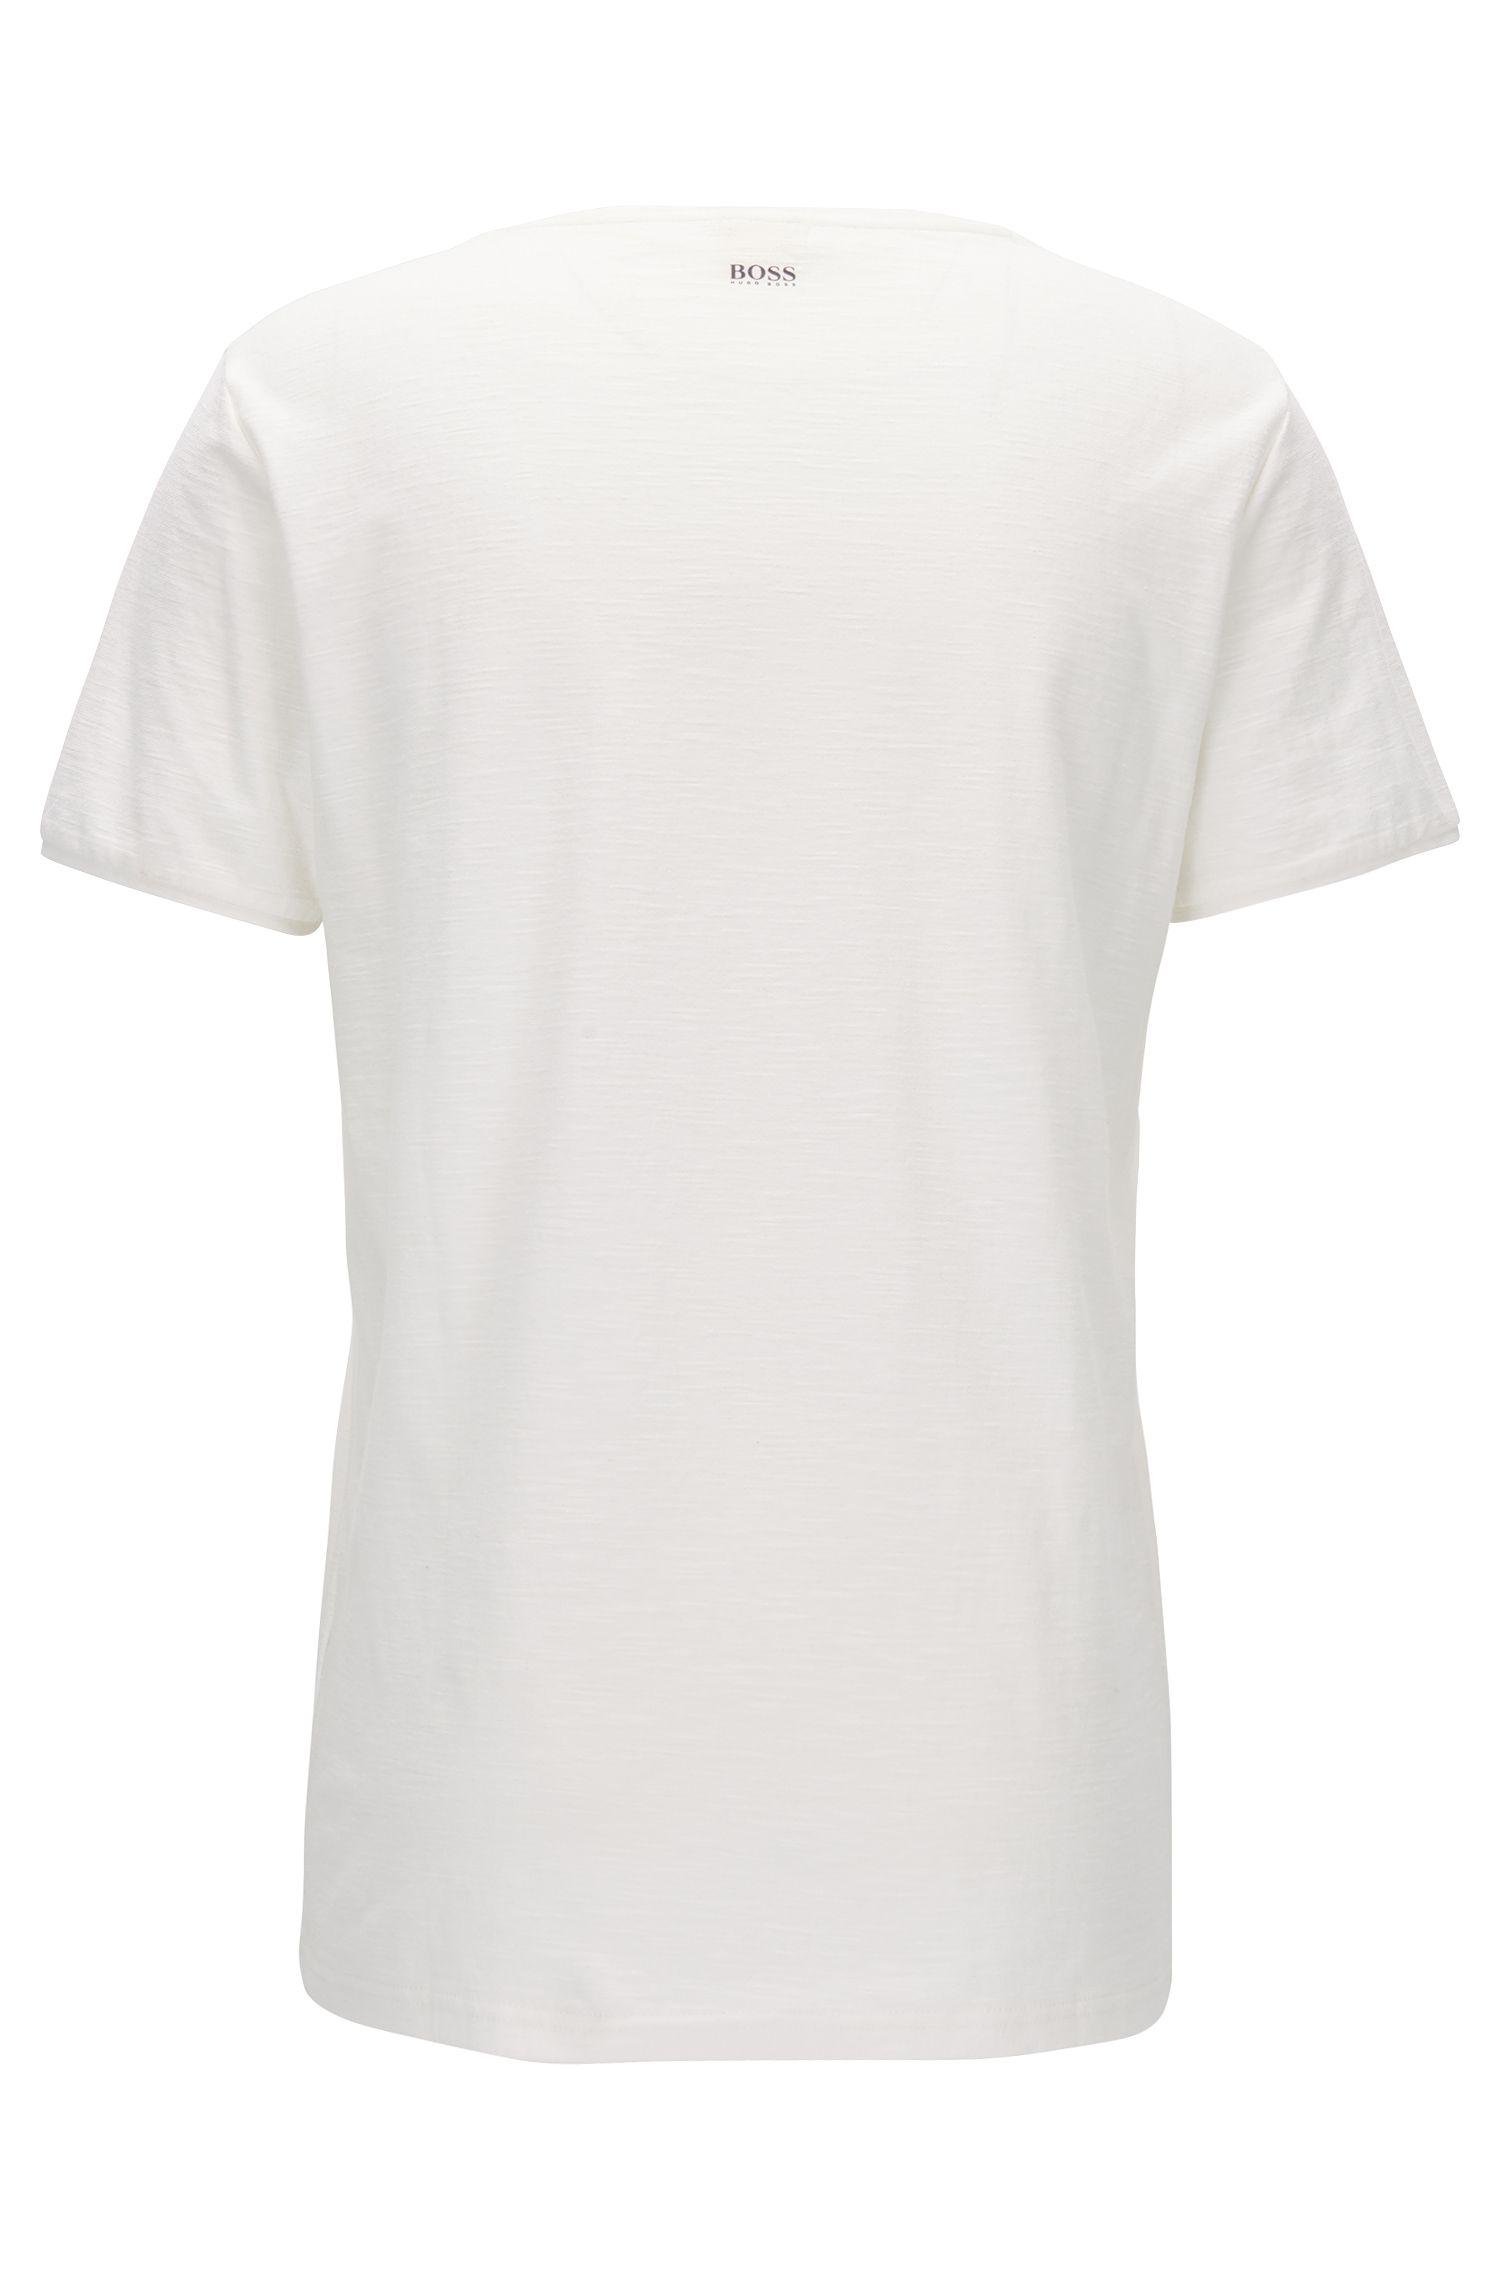 Regular-fit slub-yarn cotton jersey T-shirt with mixed graphic print